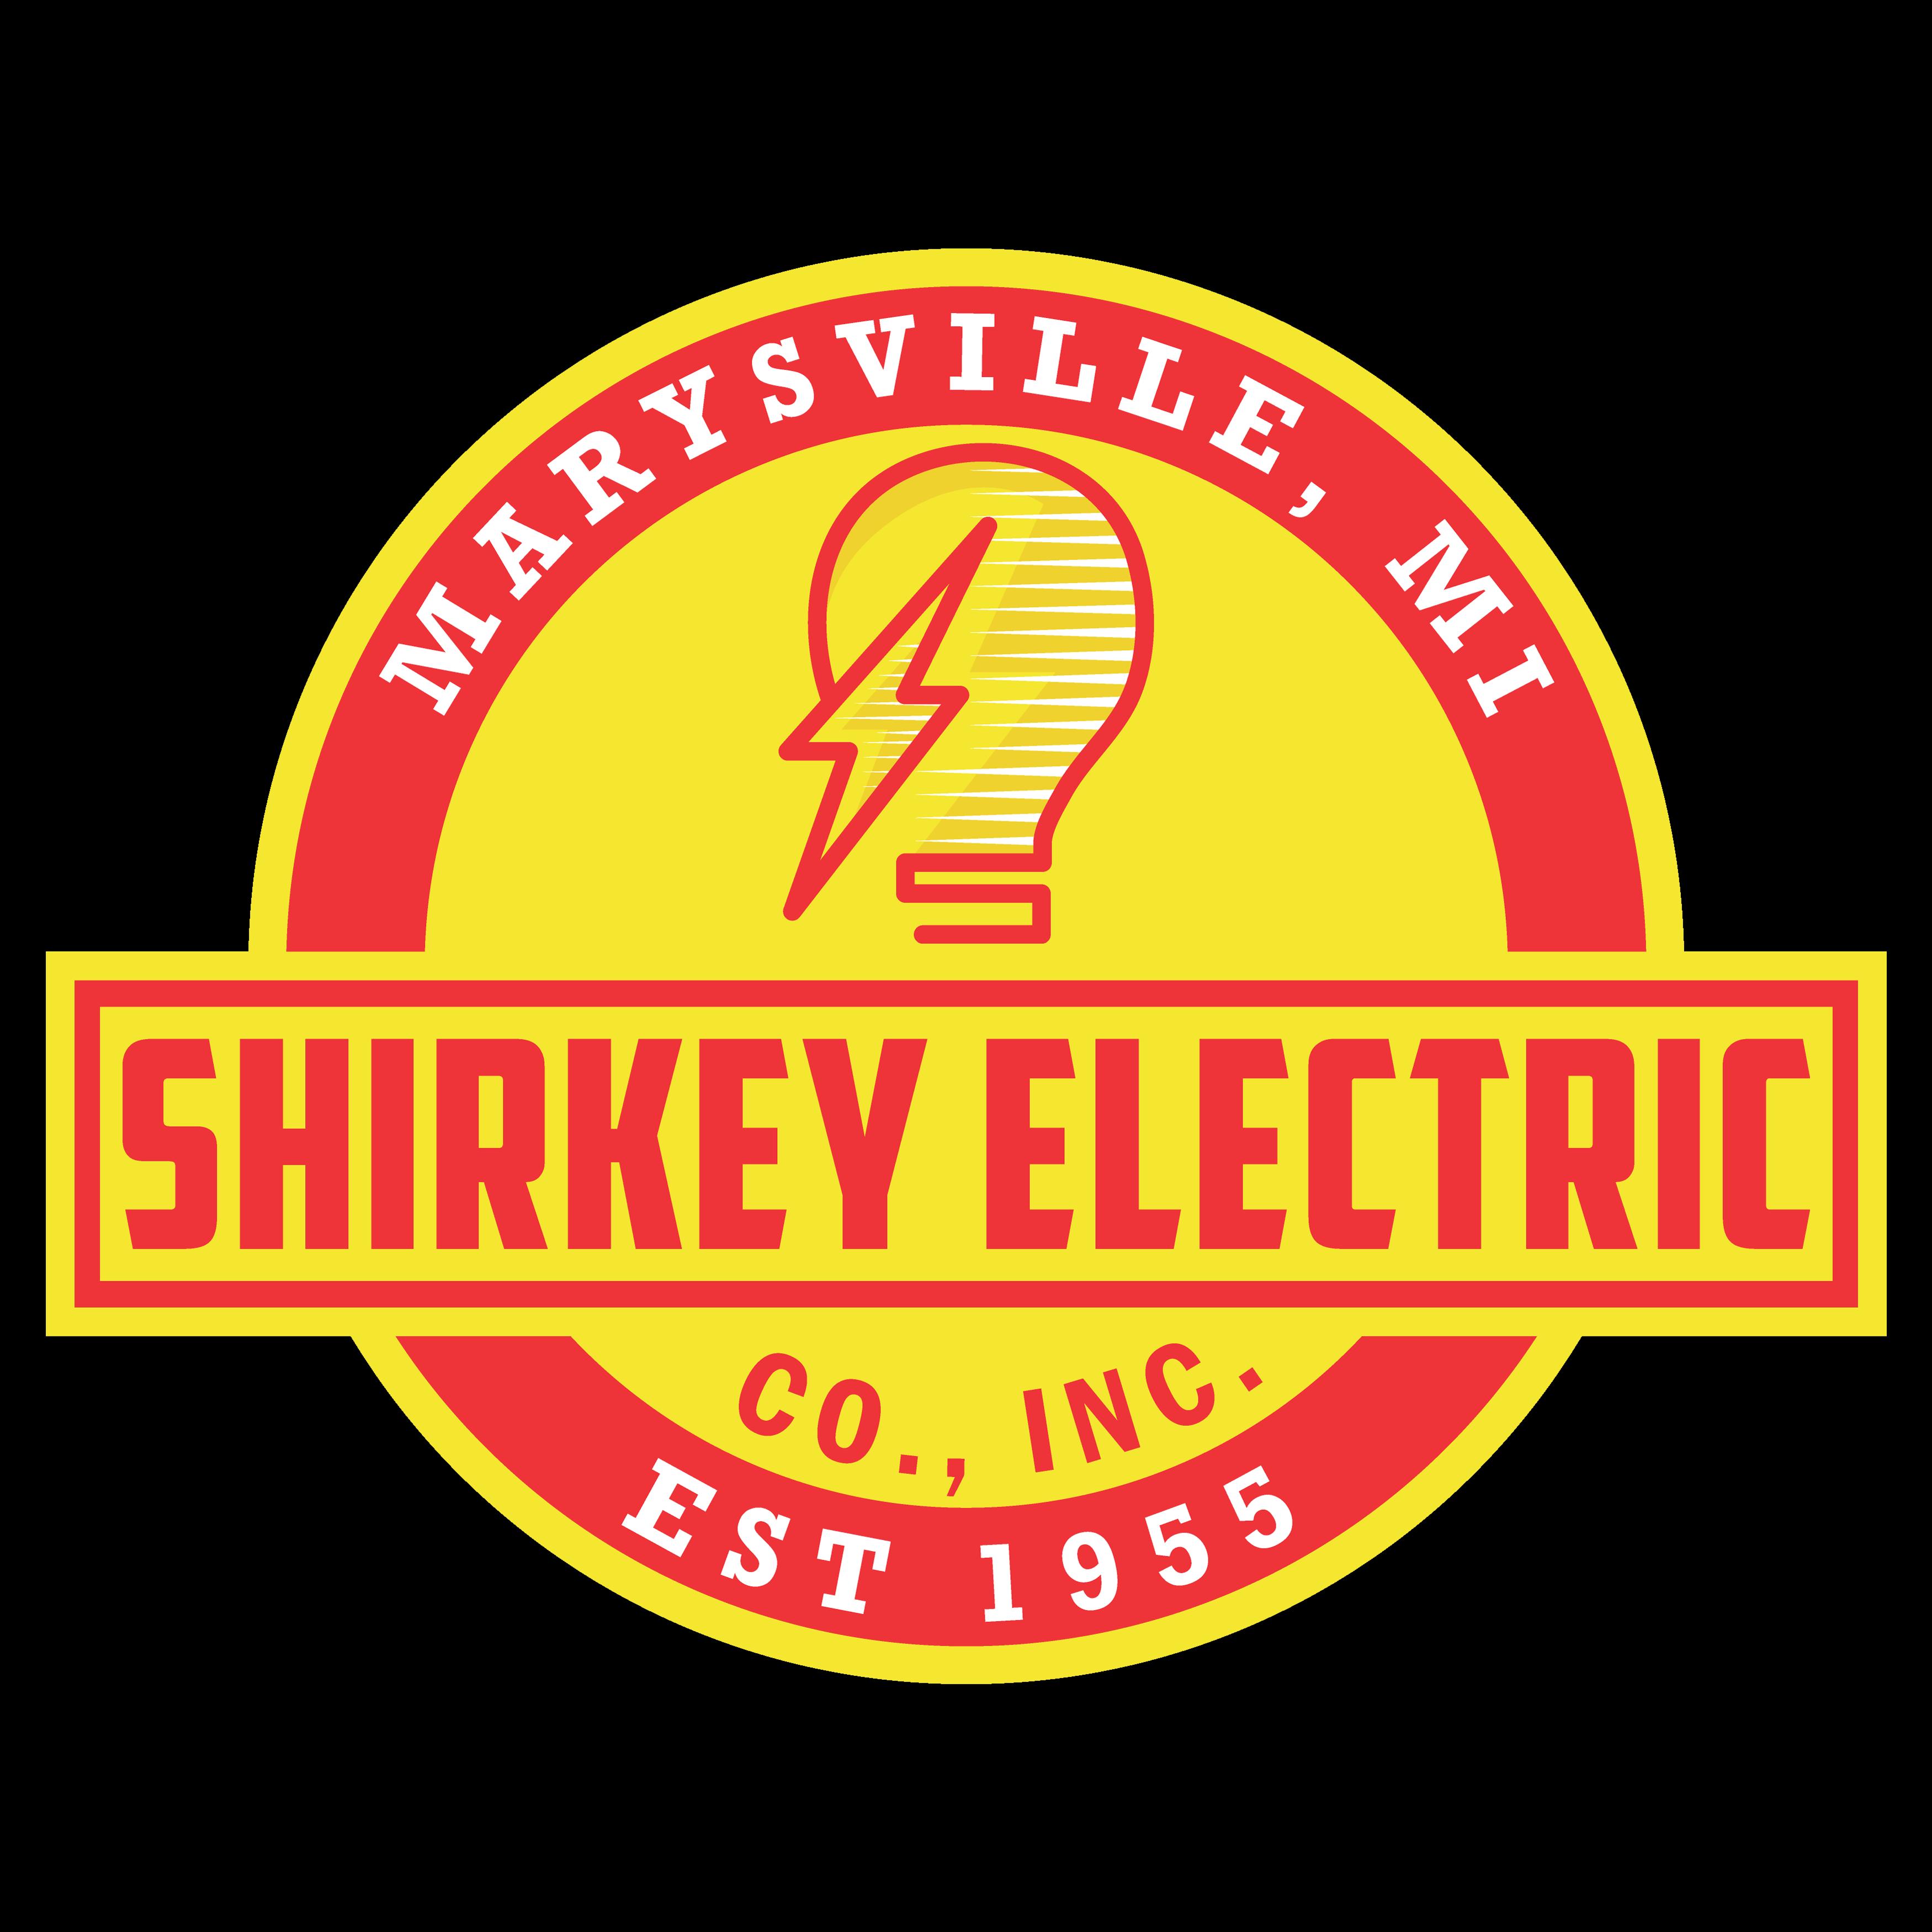 Shirkey Electric Co. Inc.